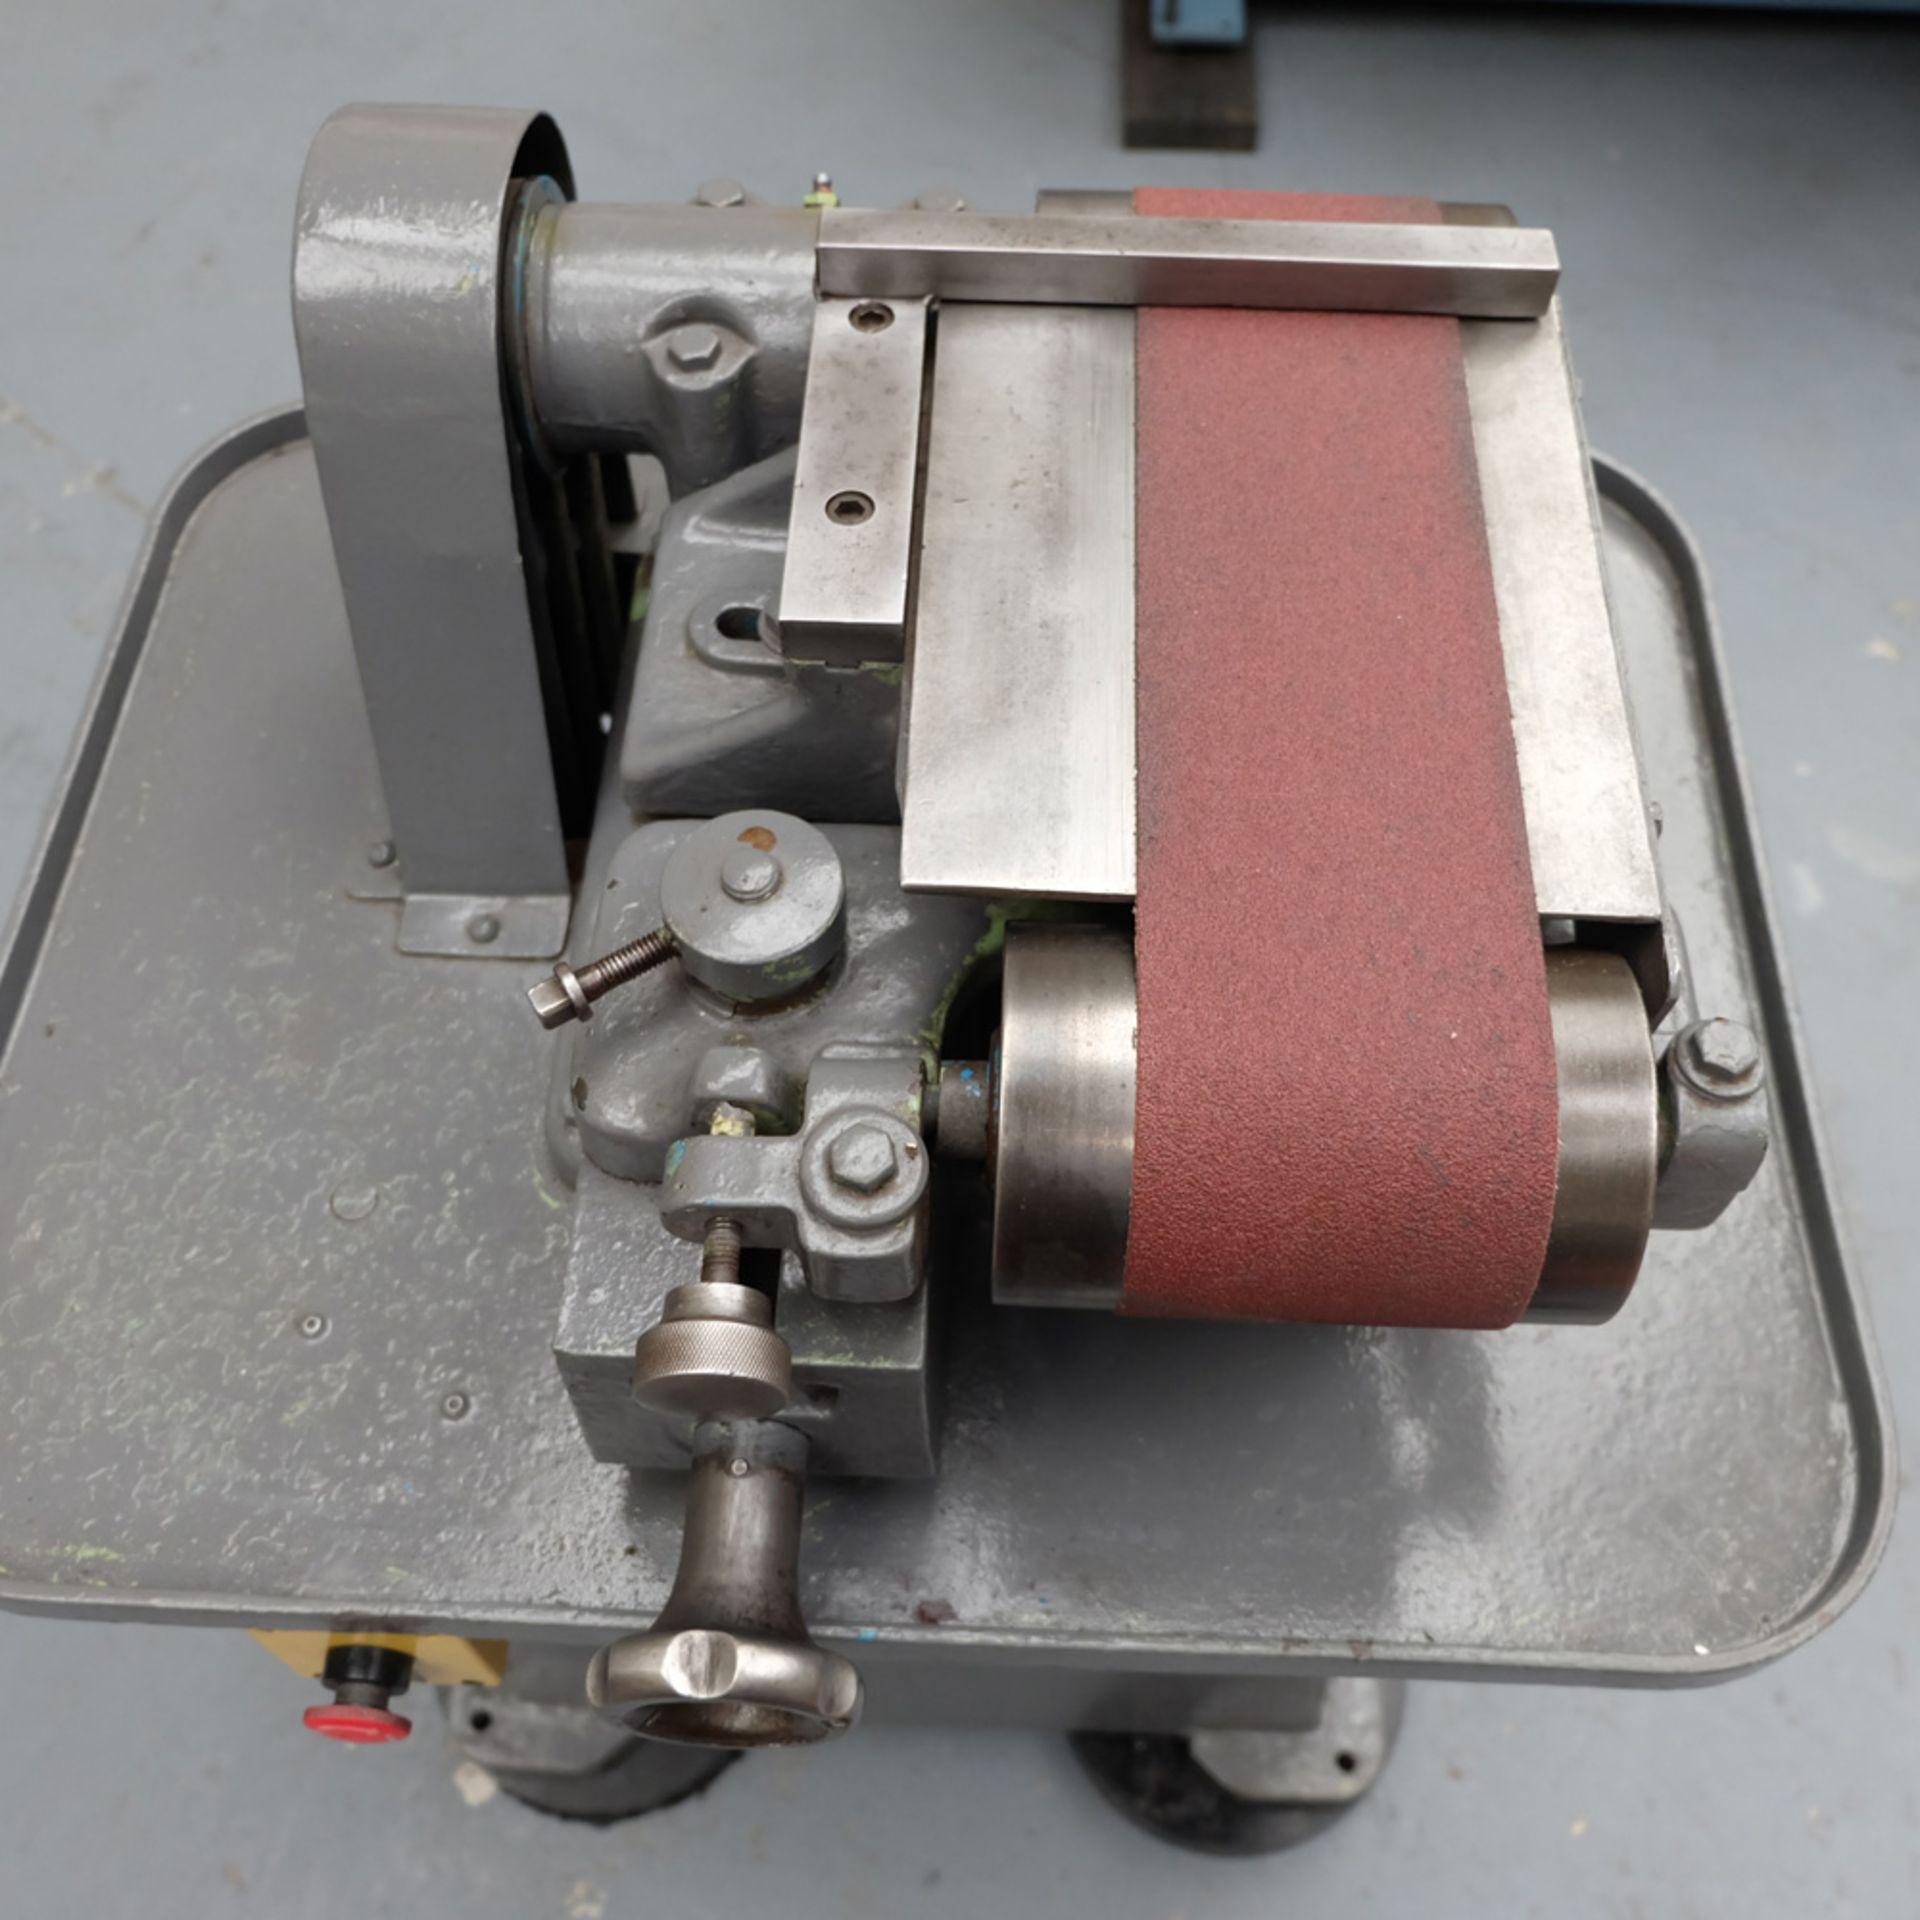 Morrisflex Model A4 1/2 Horizontal Linisher on Heavy Duty Steel Table. - Image 5 of 6